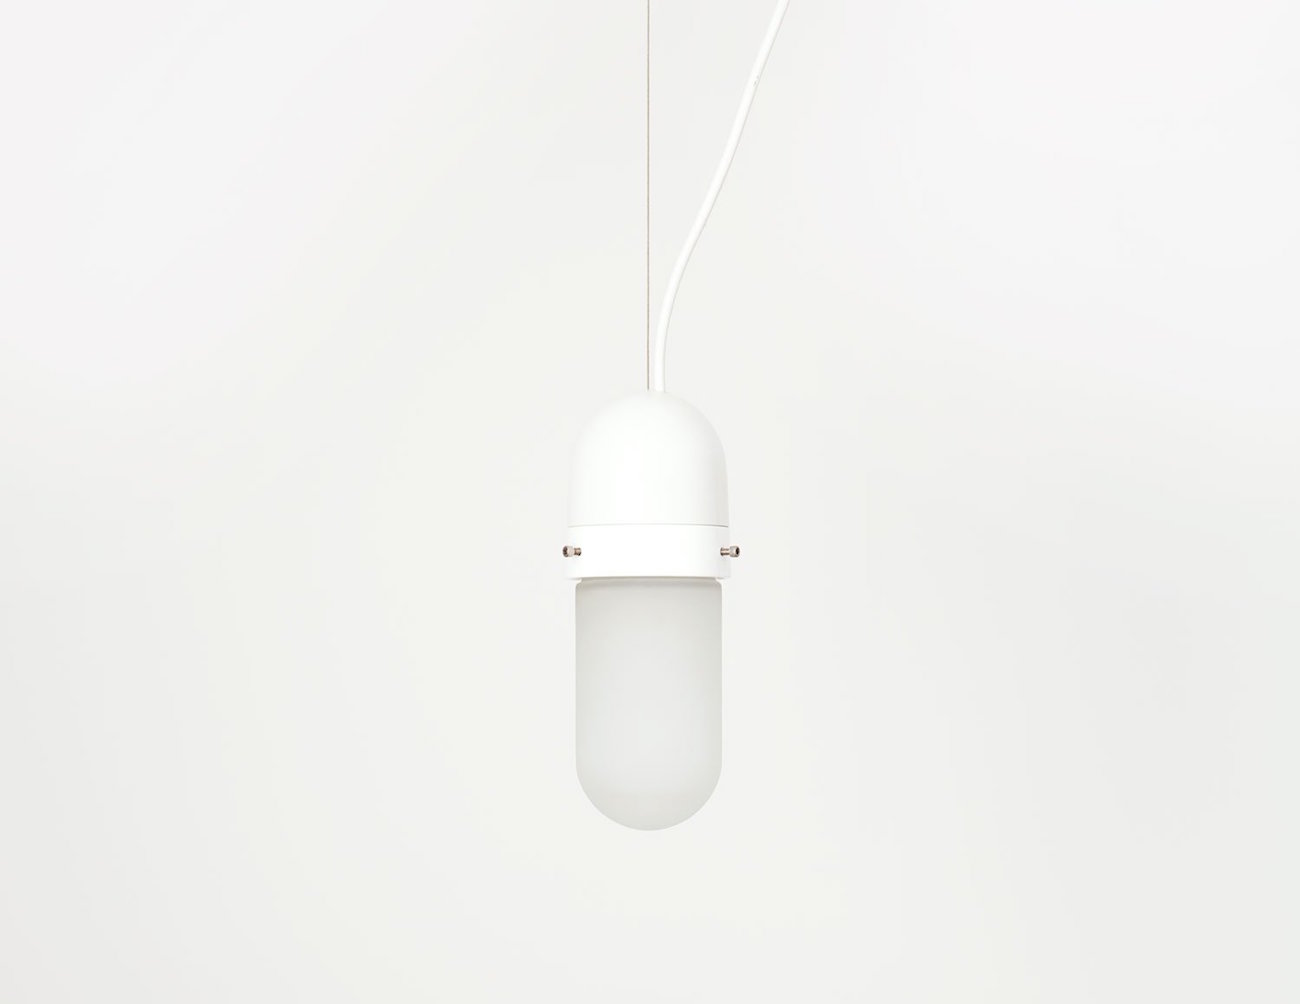 Well Light Pill by Object/Interface